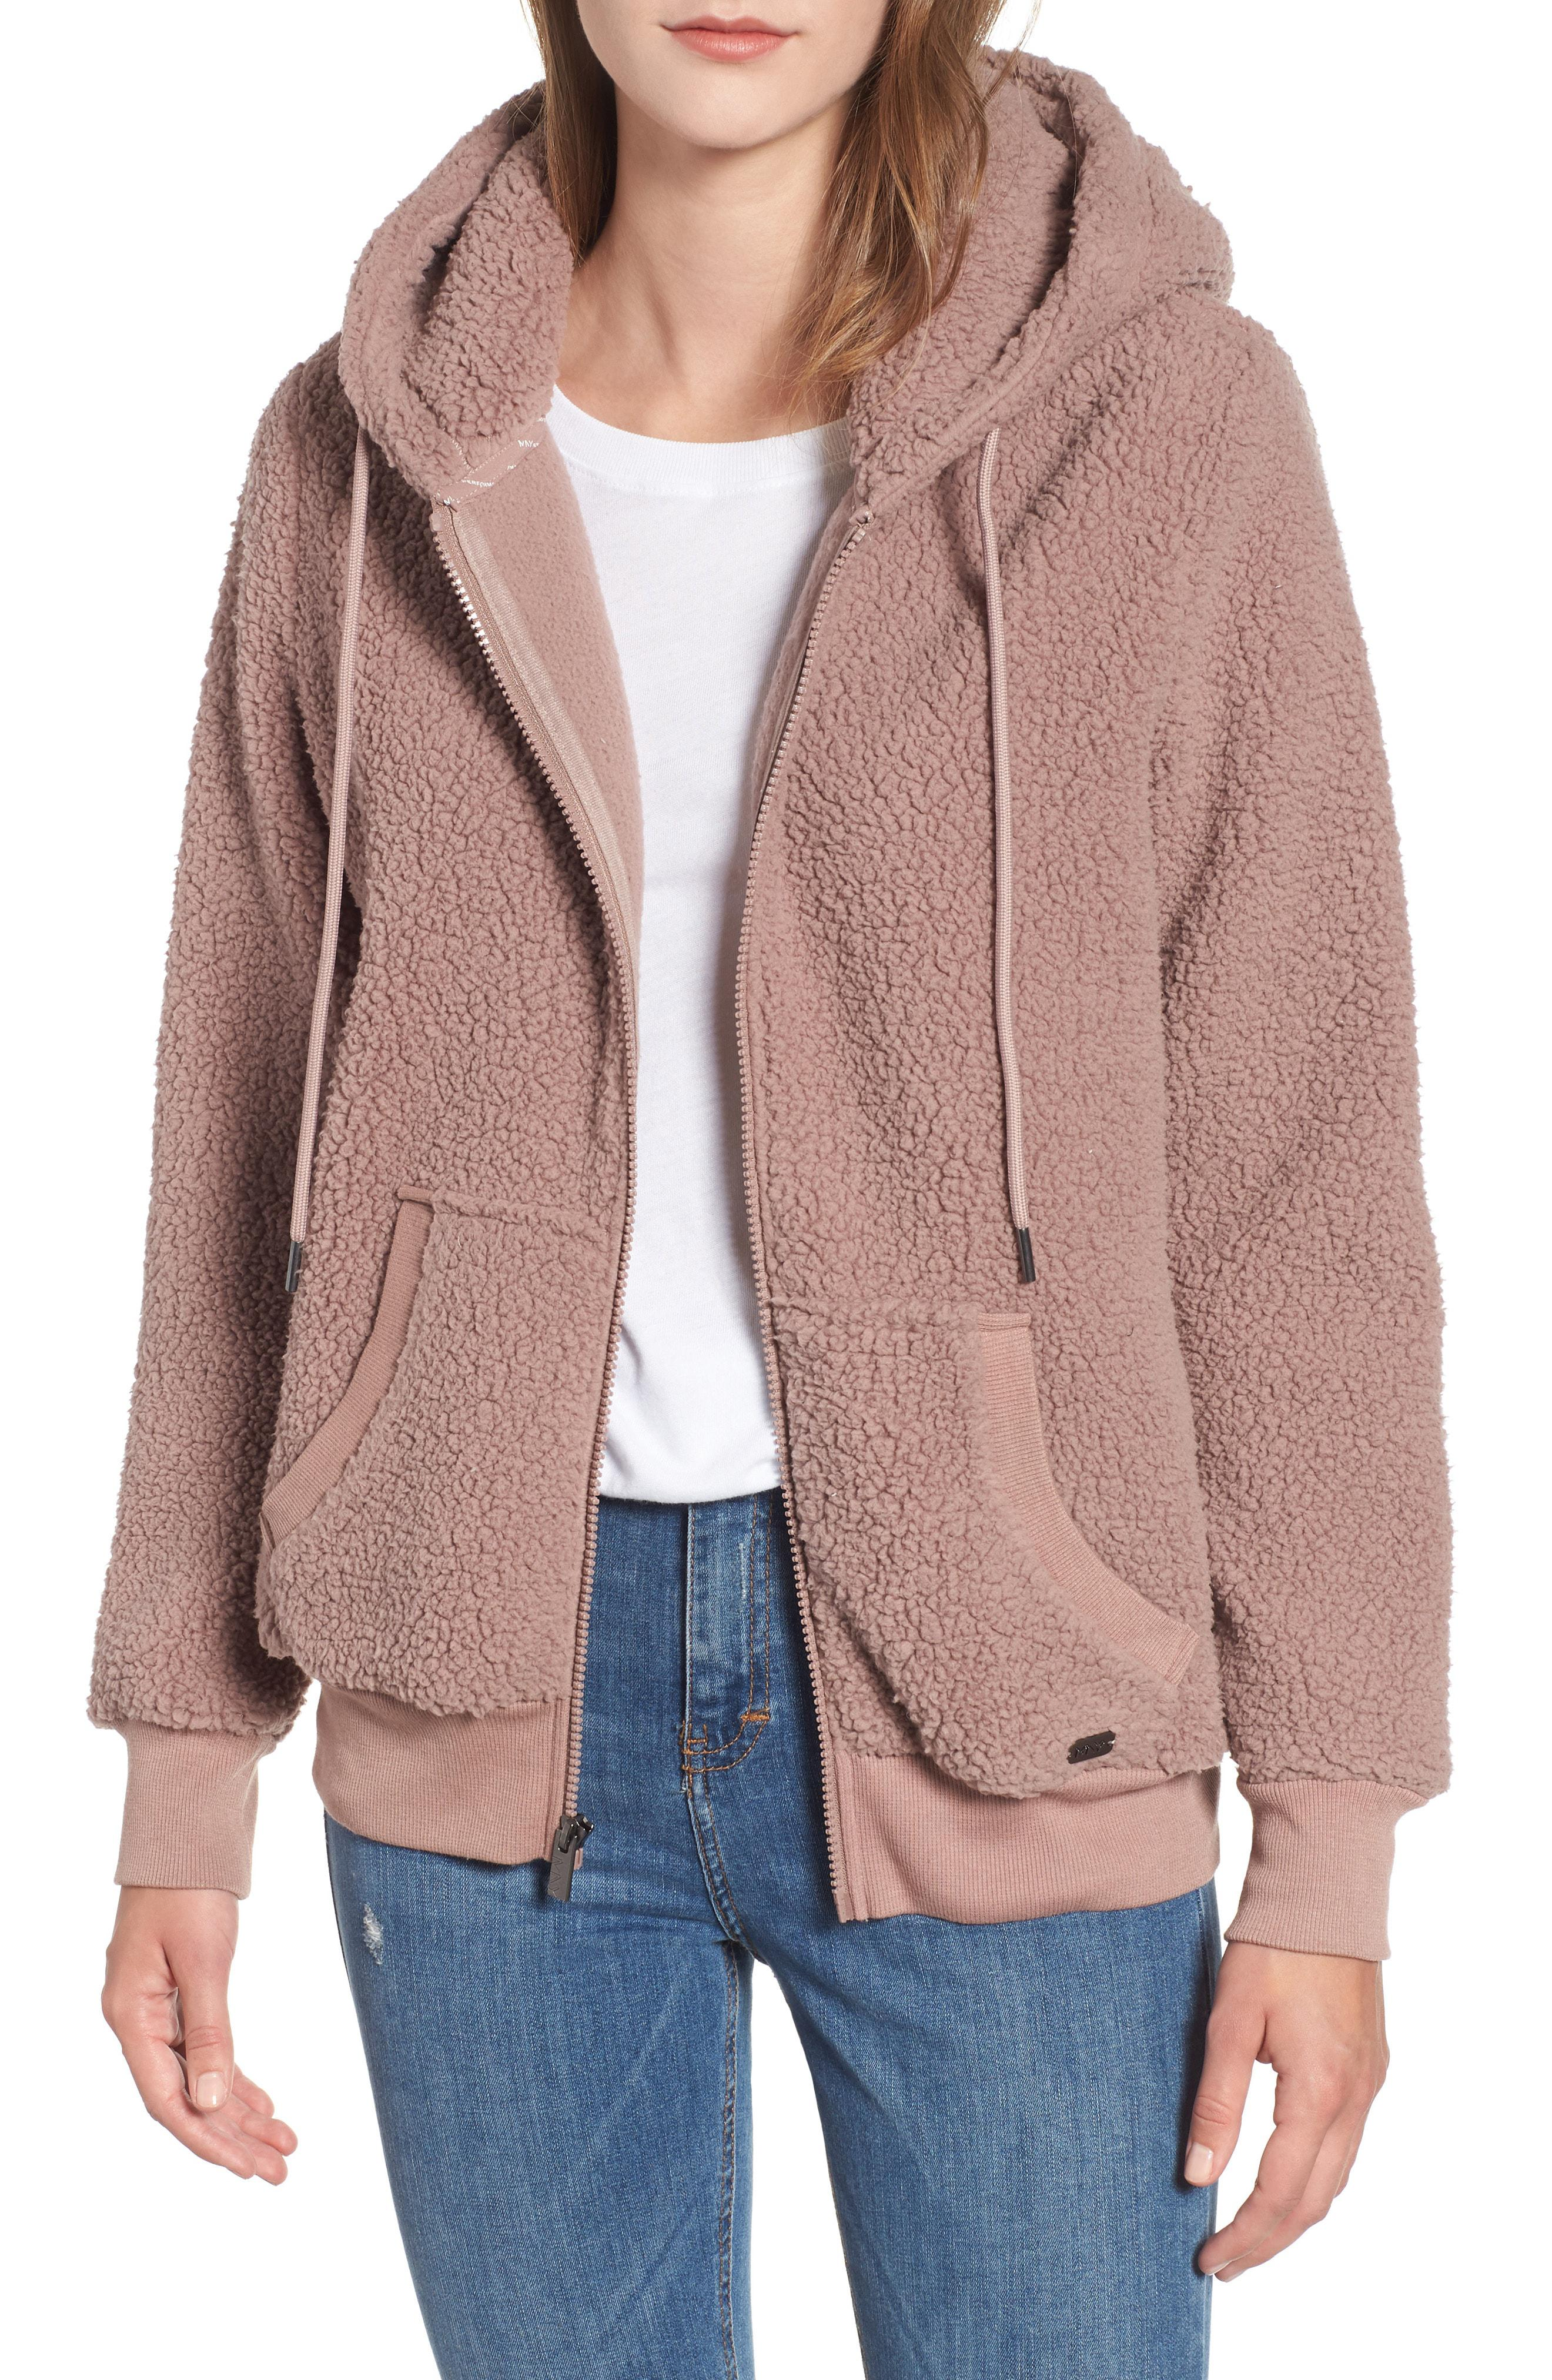 fleece-outerwear-jackets Donna Essentials Polar Fleece Lined Sherpa Full-zip Jacket